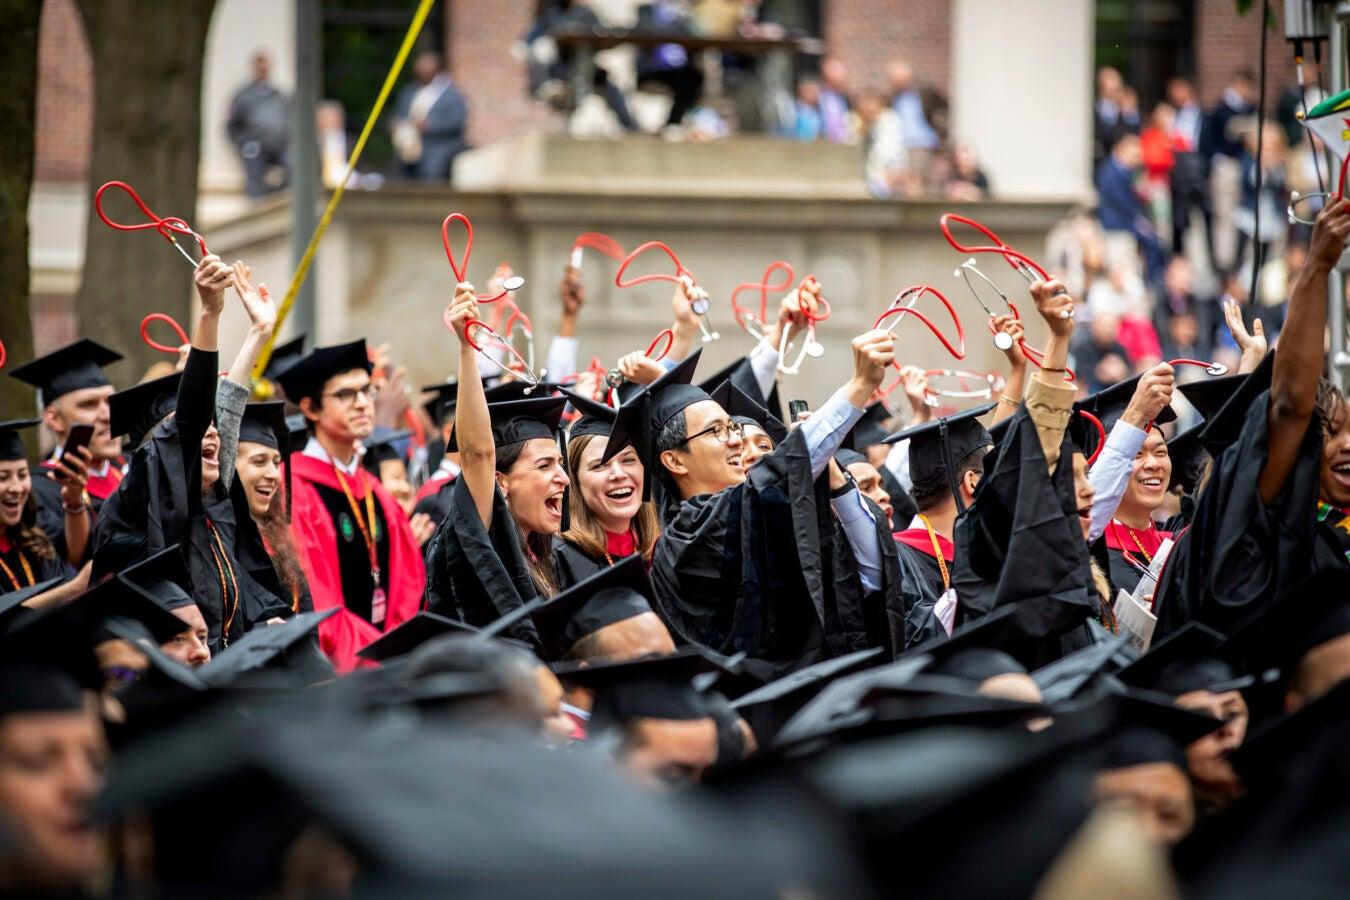 Shining moments from Harvard's Commencement – Harvard Gazette